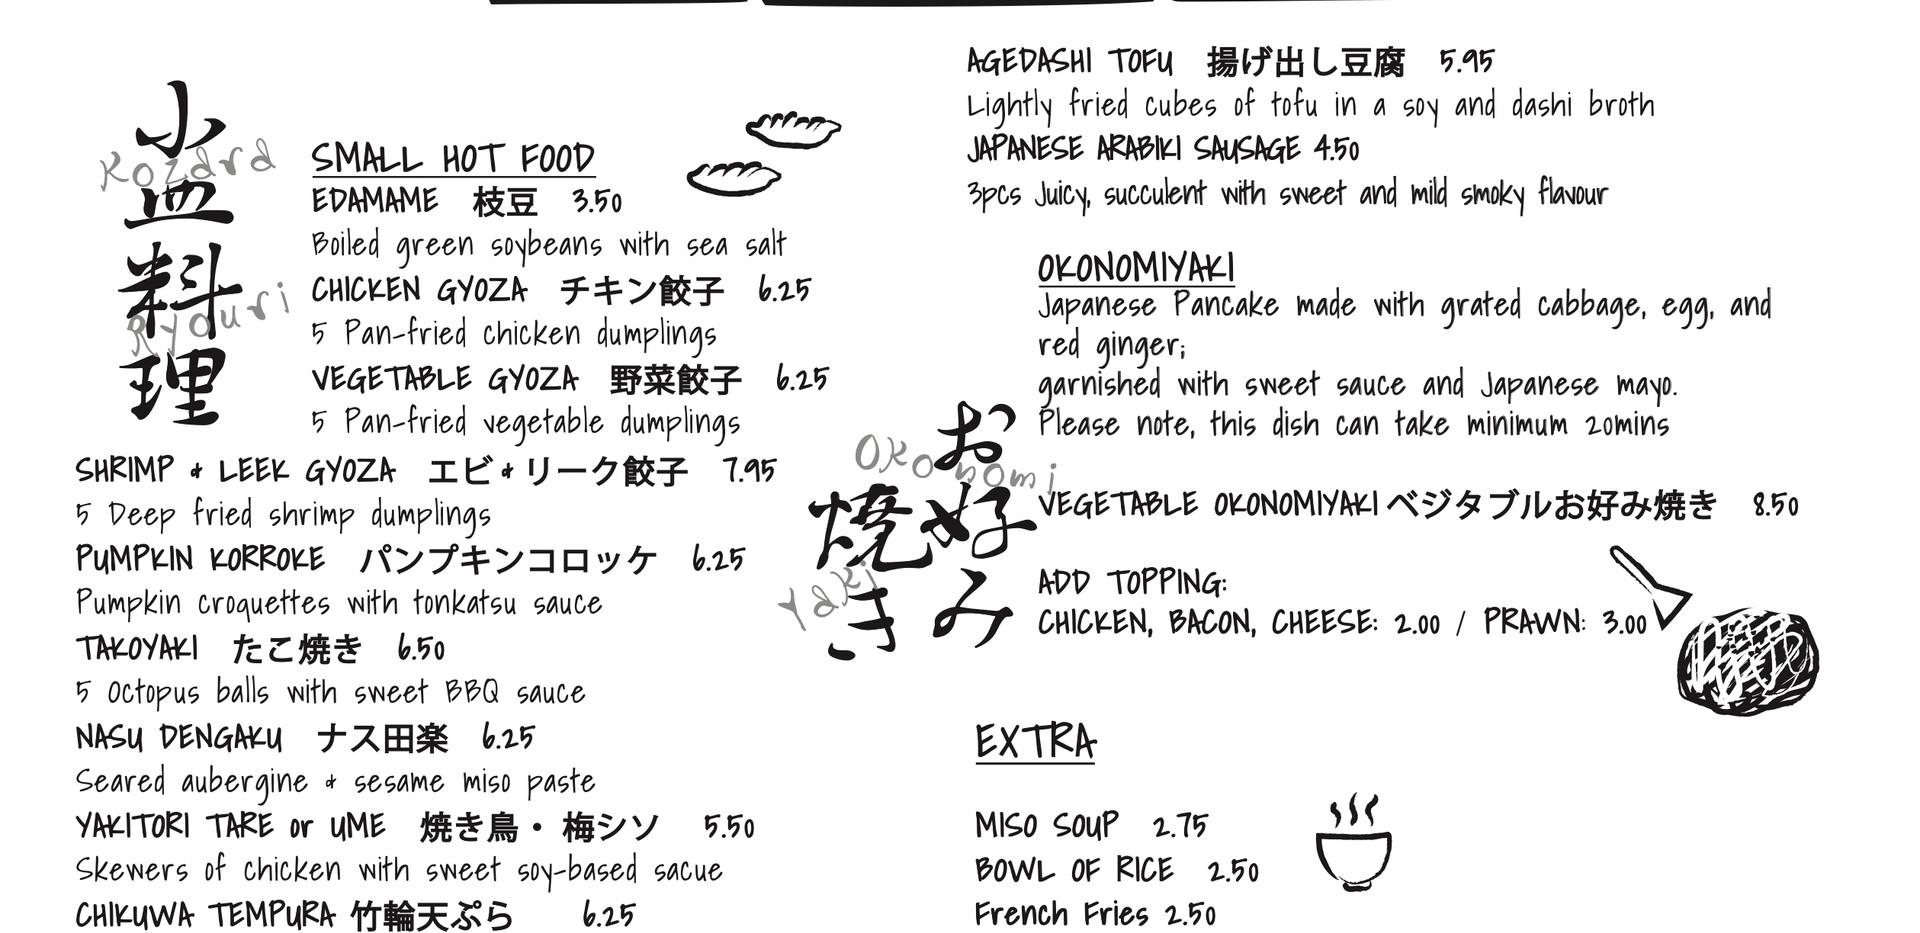 Tenshi Menu July 2020 3.jpg